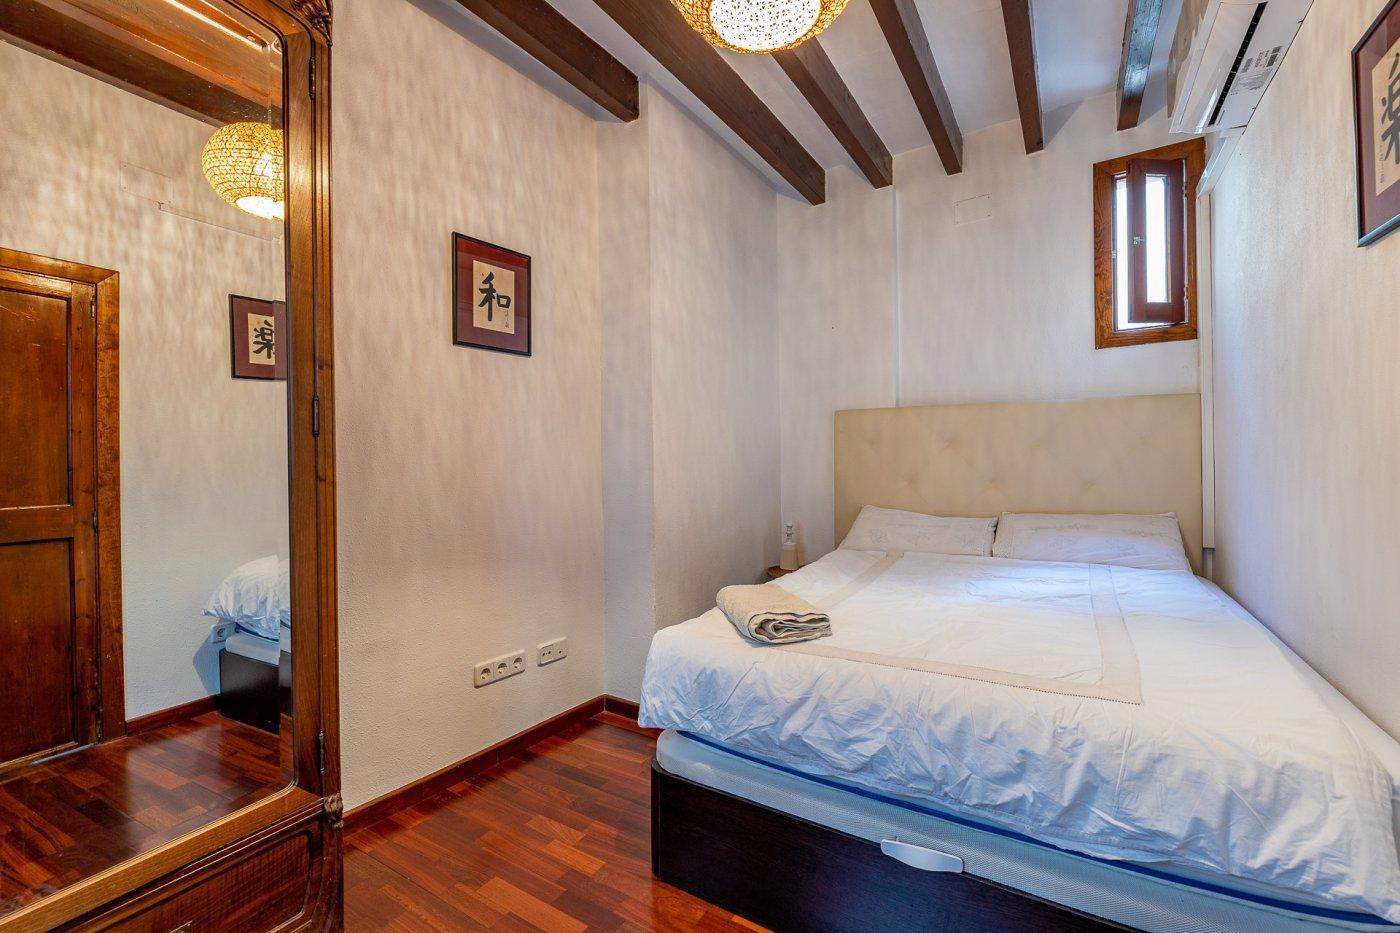 Espectacular apartamento en centro de palma - imagenInmueble7